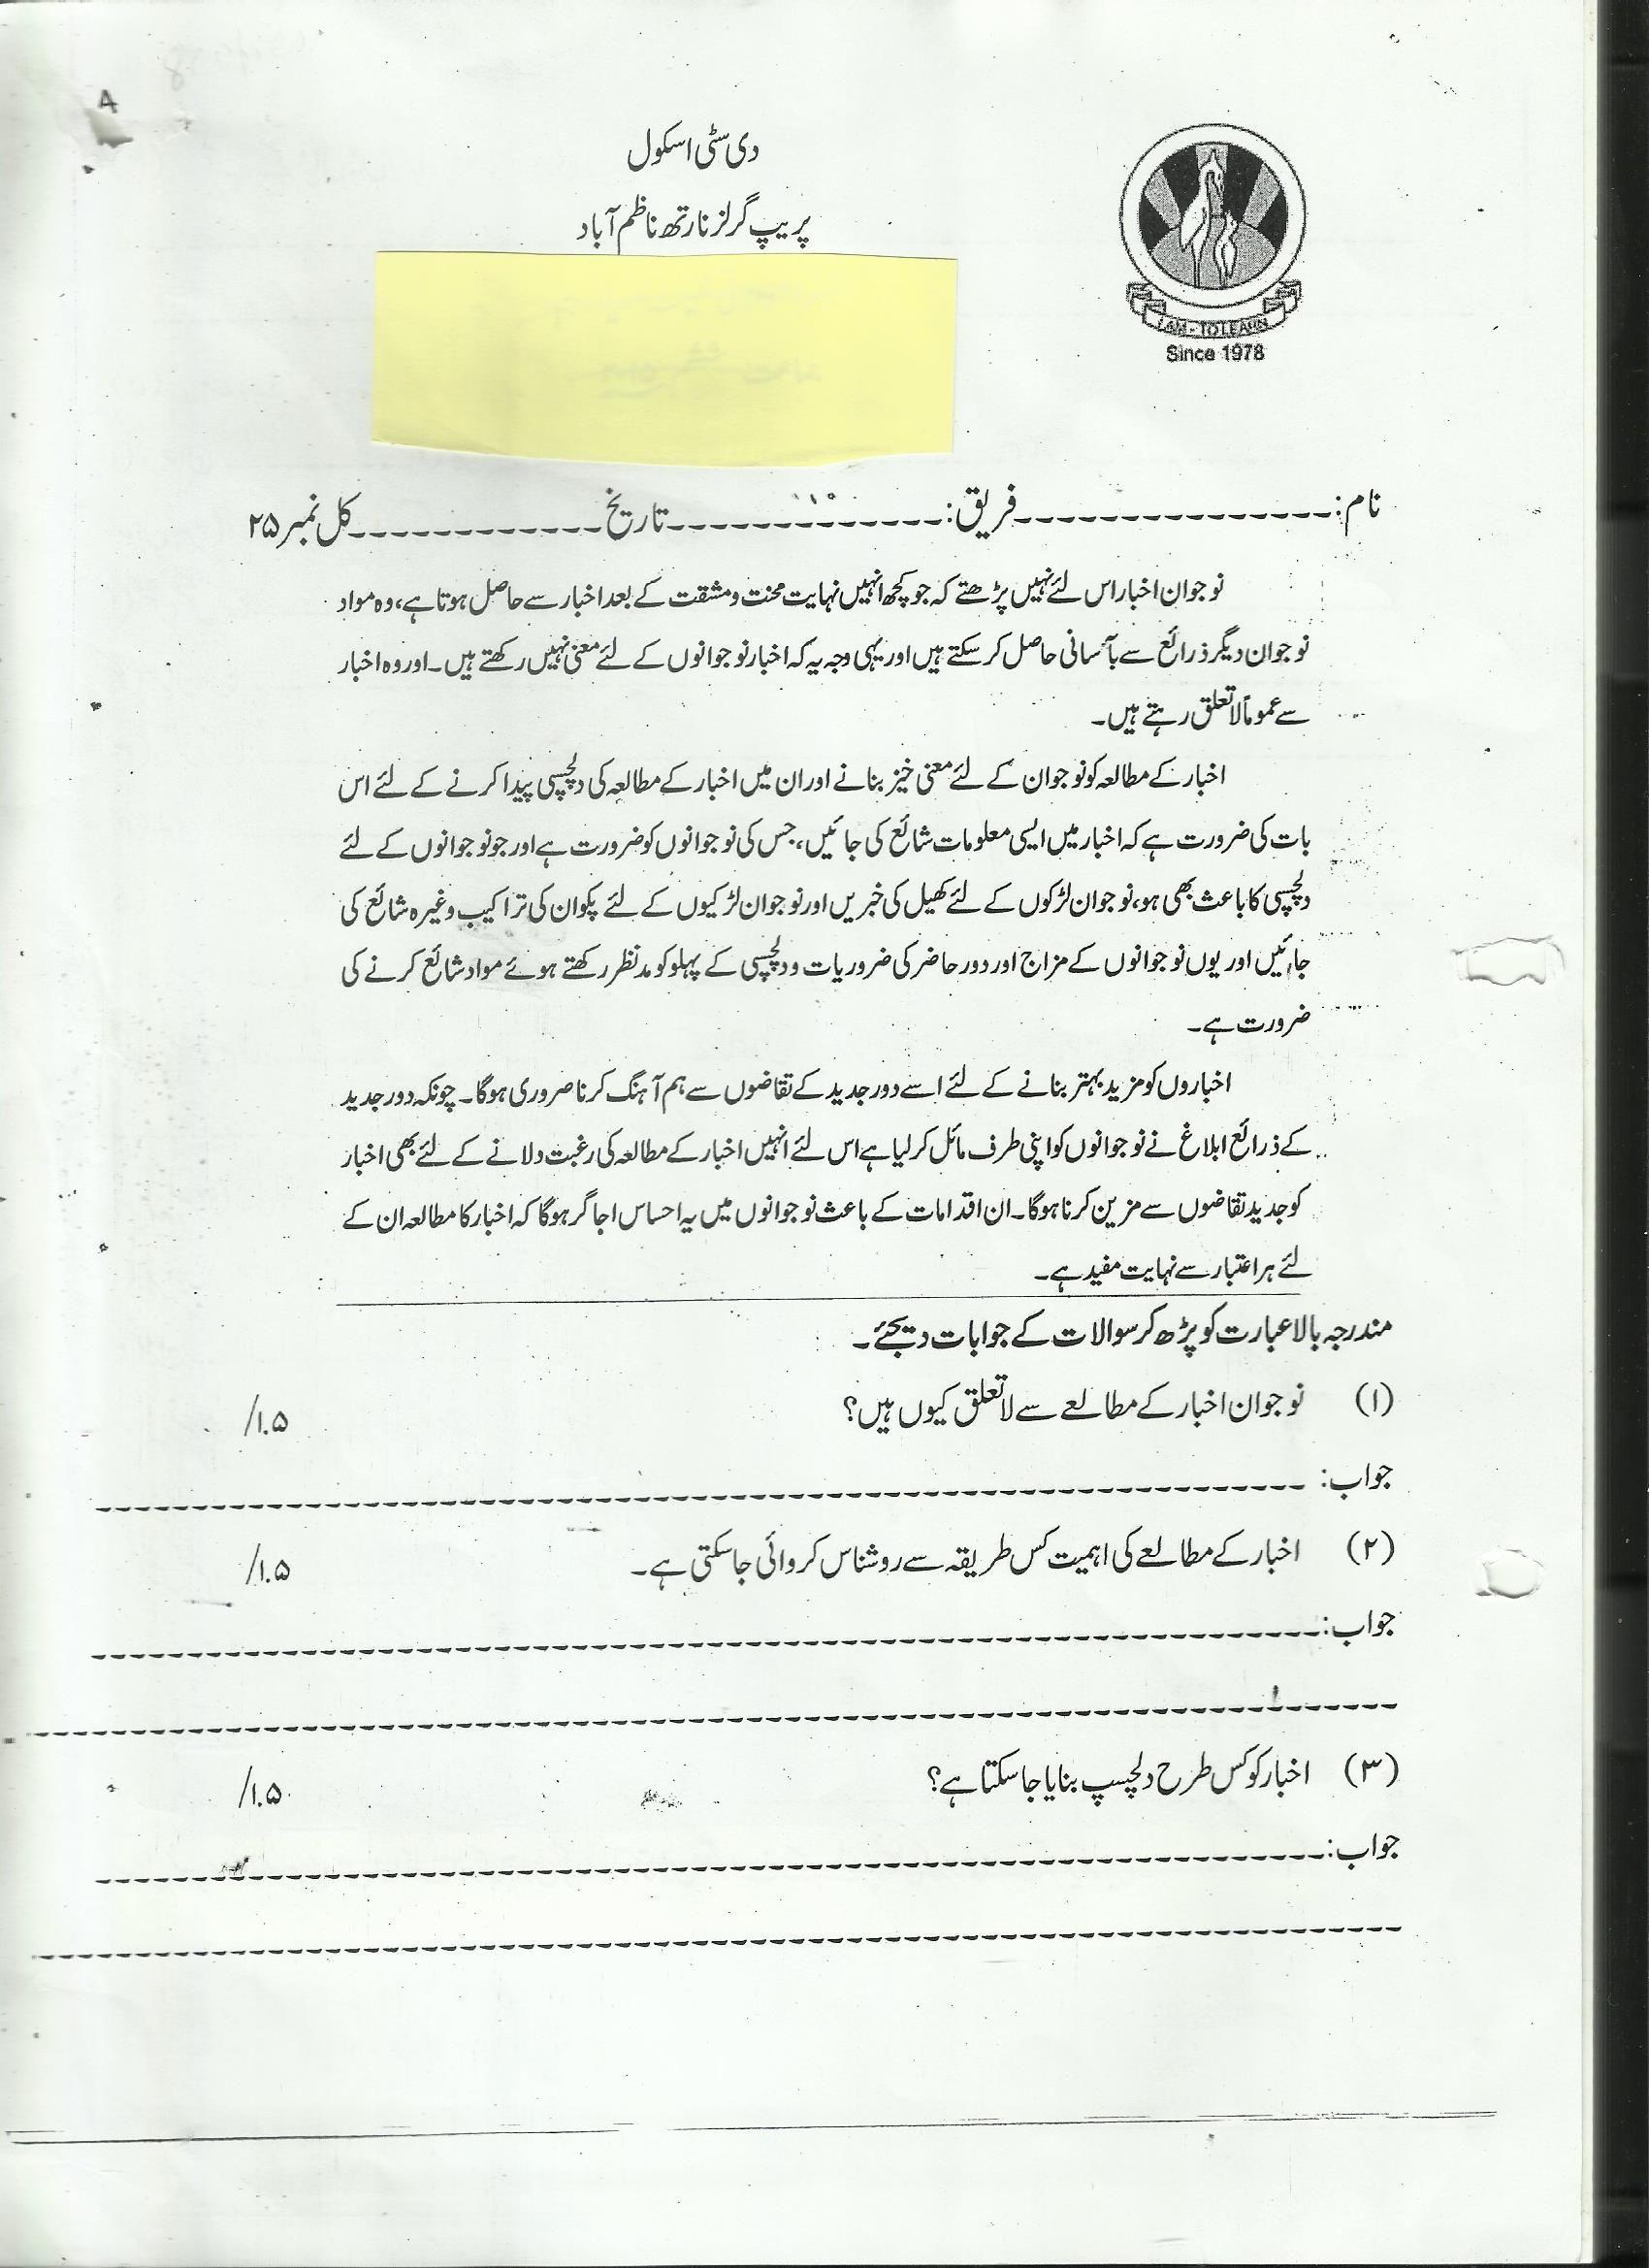 Urdu Tafheem Worksheets For Grade 4